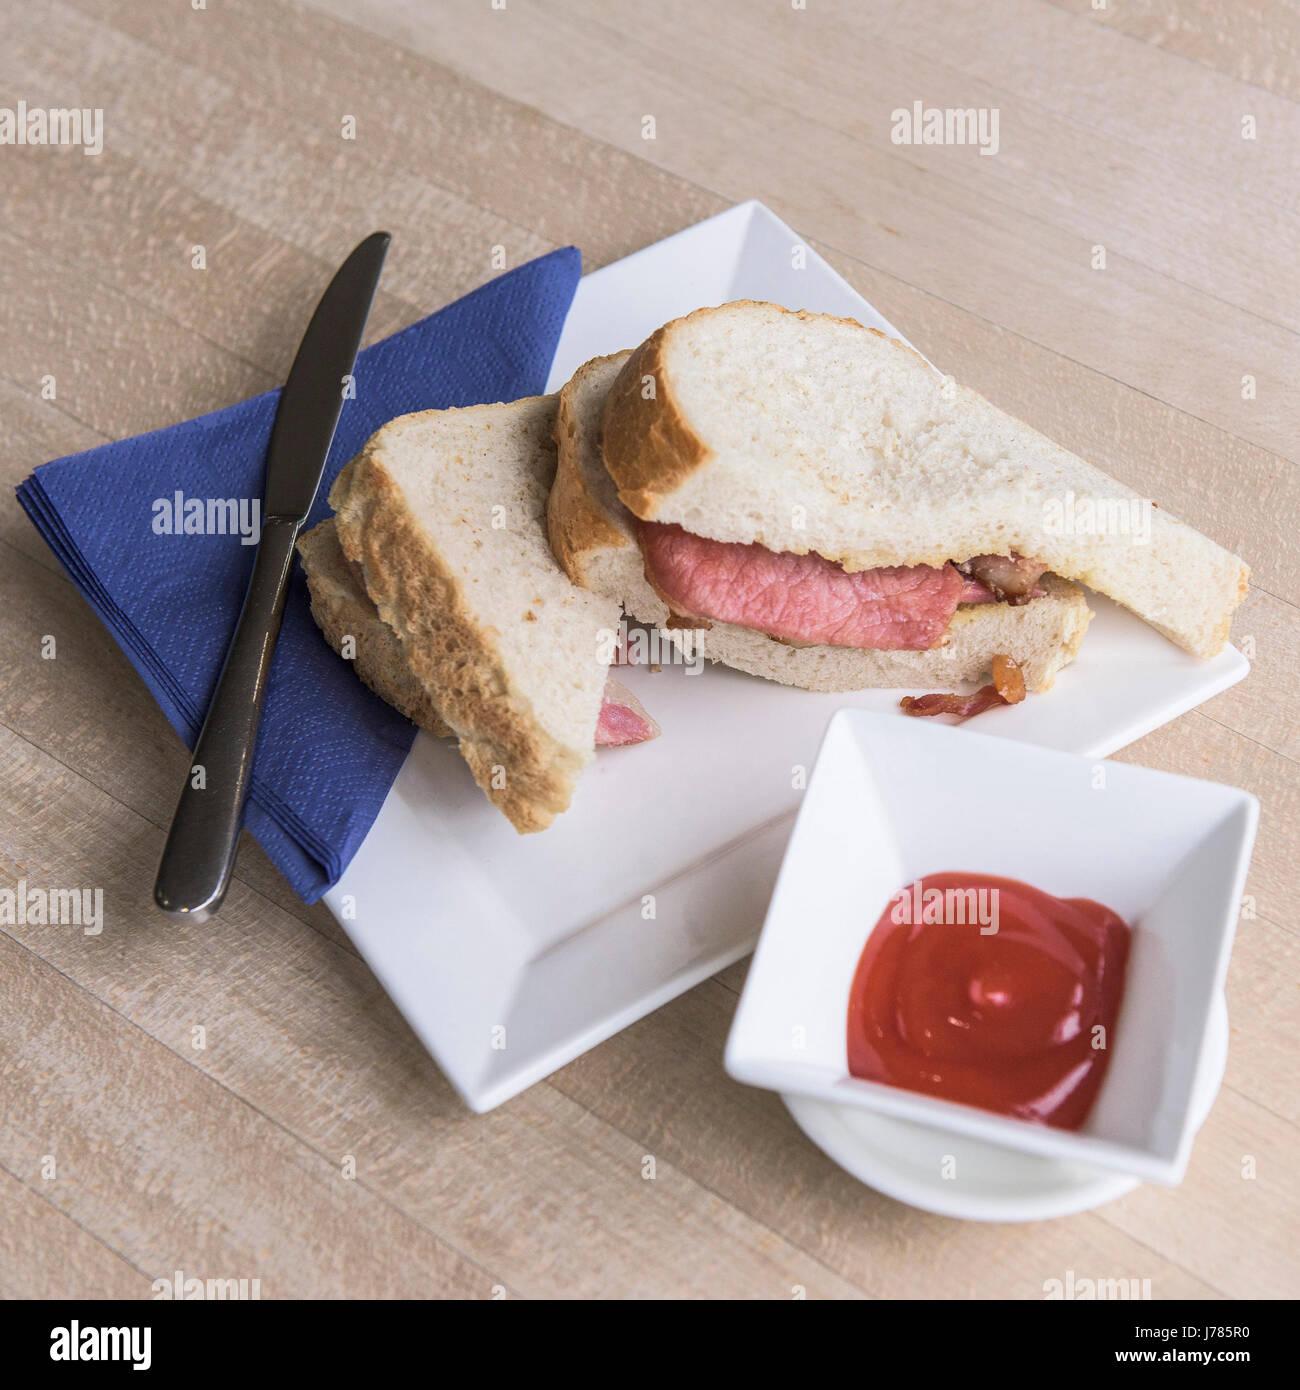 A bacon sandwich; Food; White bread; Bacon rashers; Ketchup; Plate; Knife; Napkin; - Stock Image